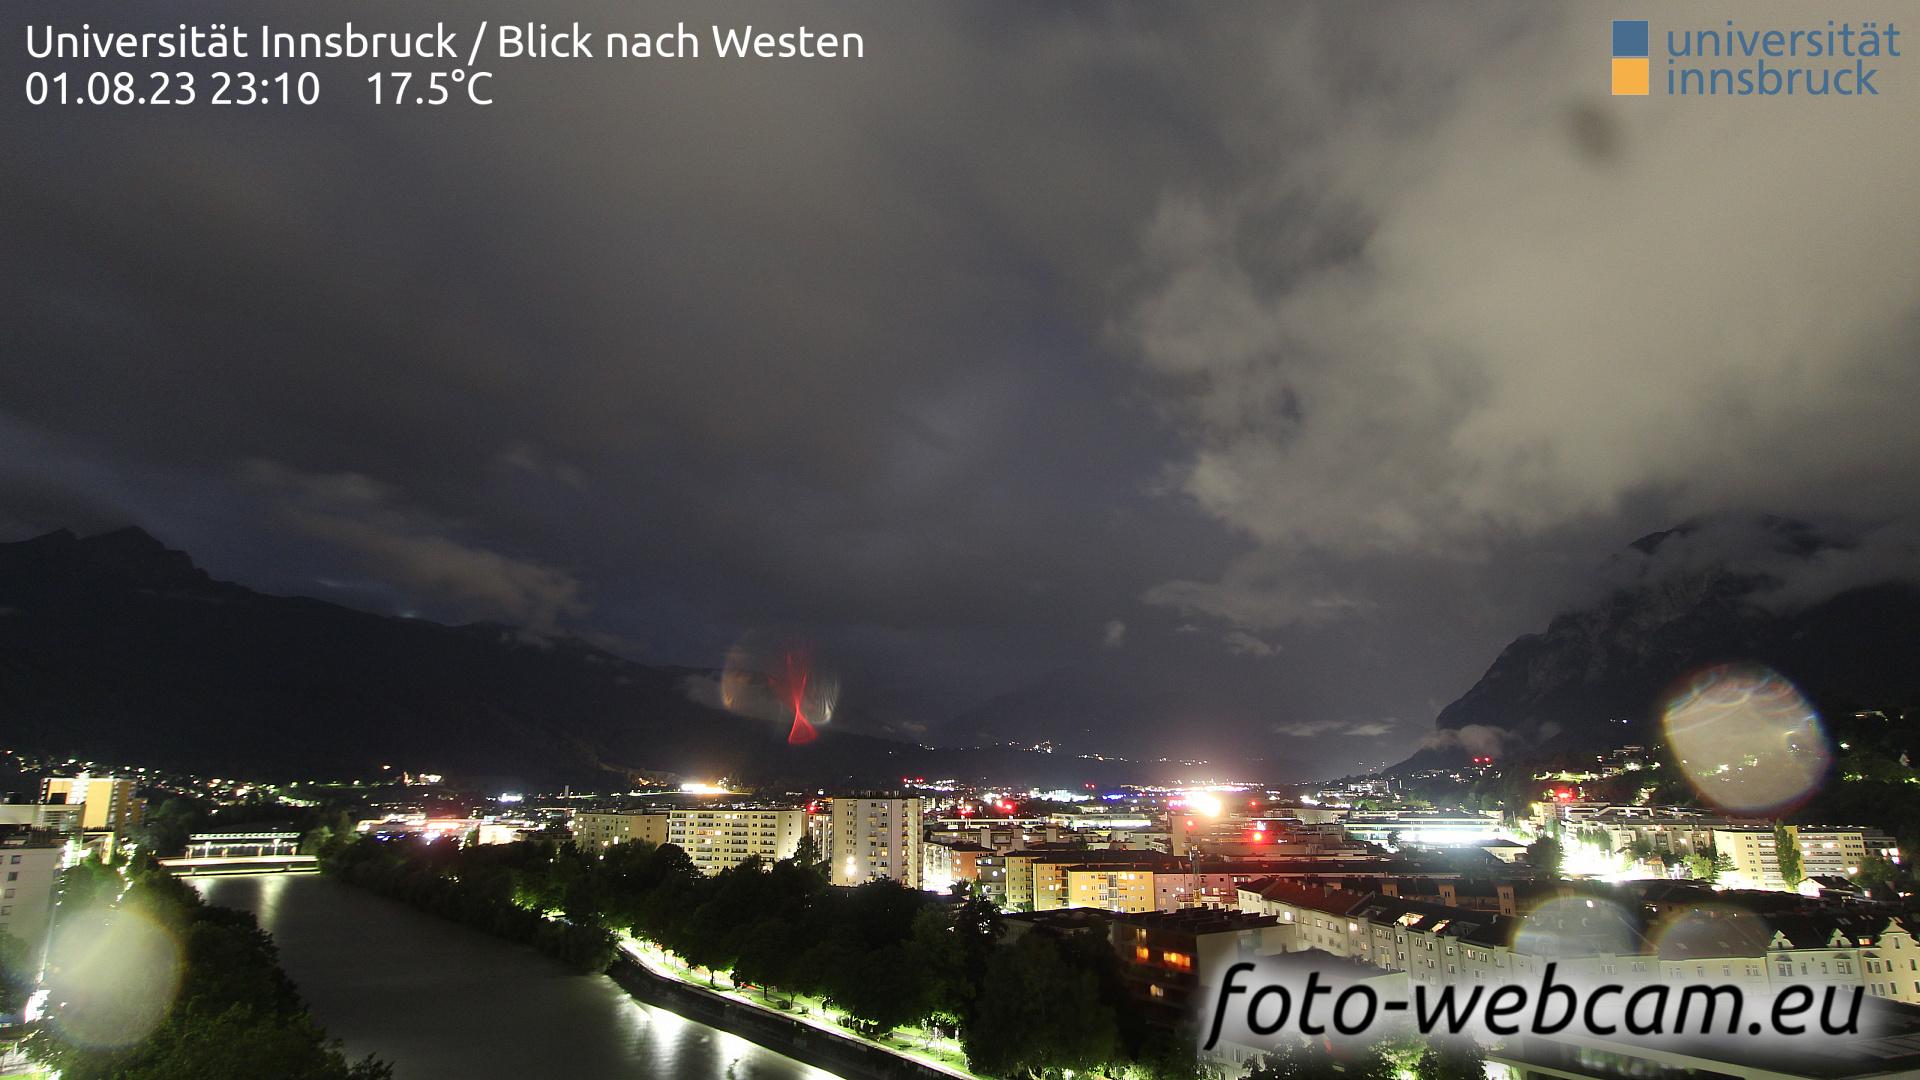 Innsbruck Sun. 23:25